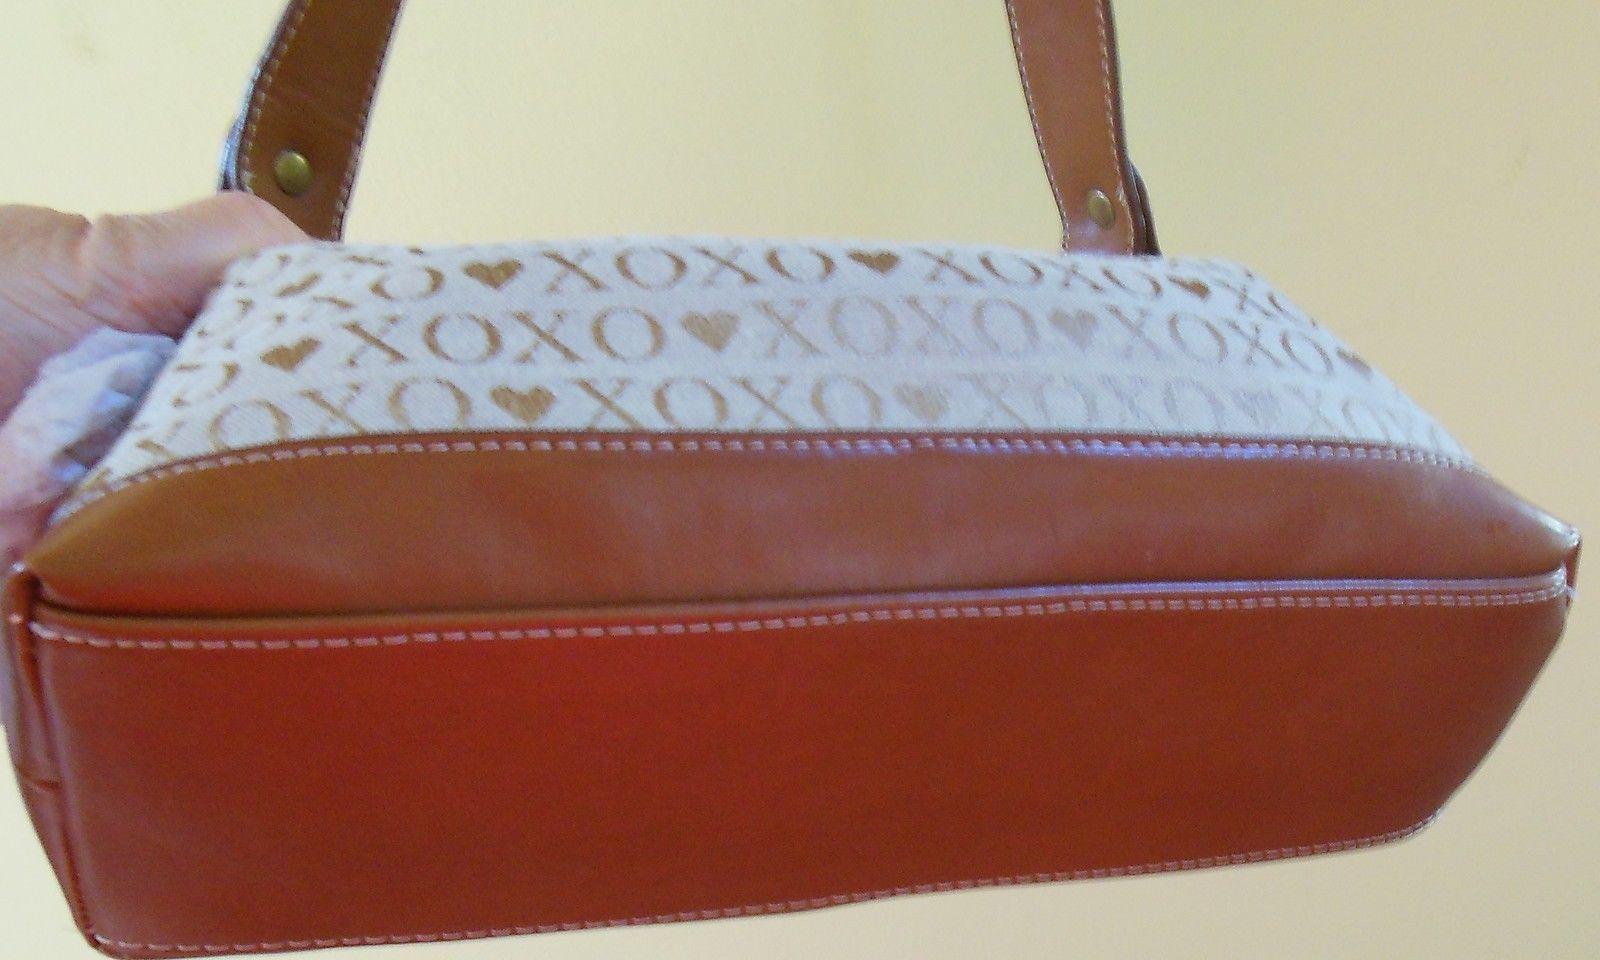 XOXO Handbag/Purse Brown/Gold/Beige